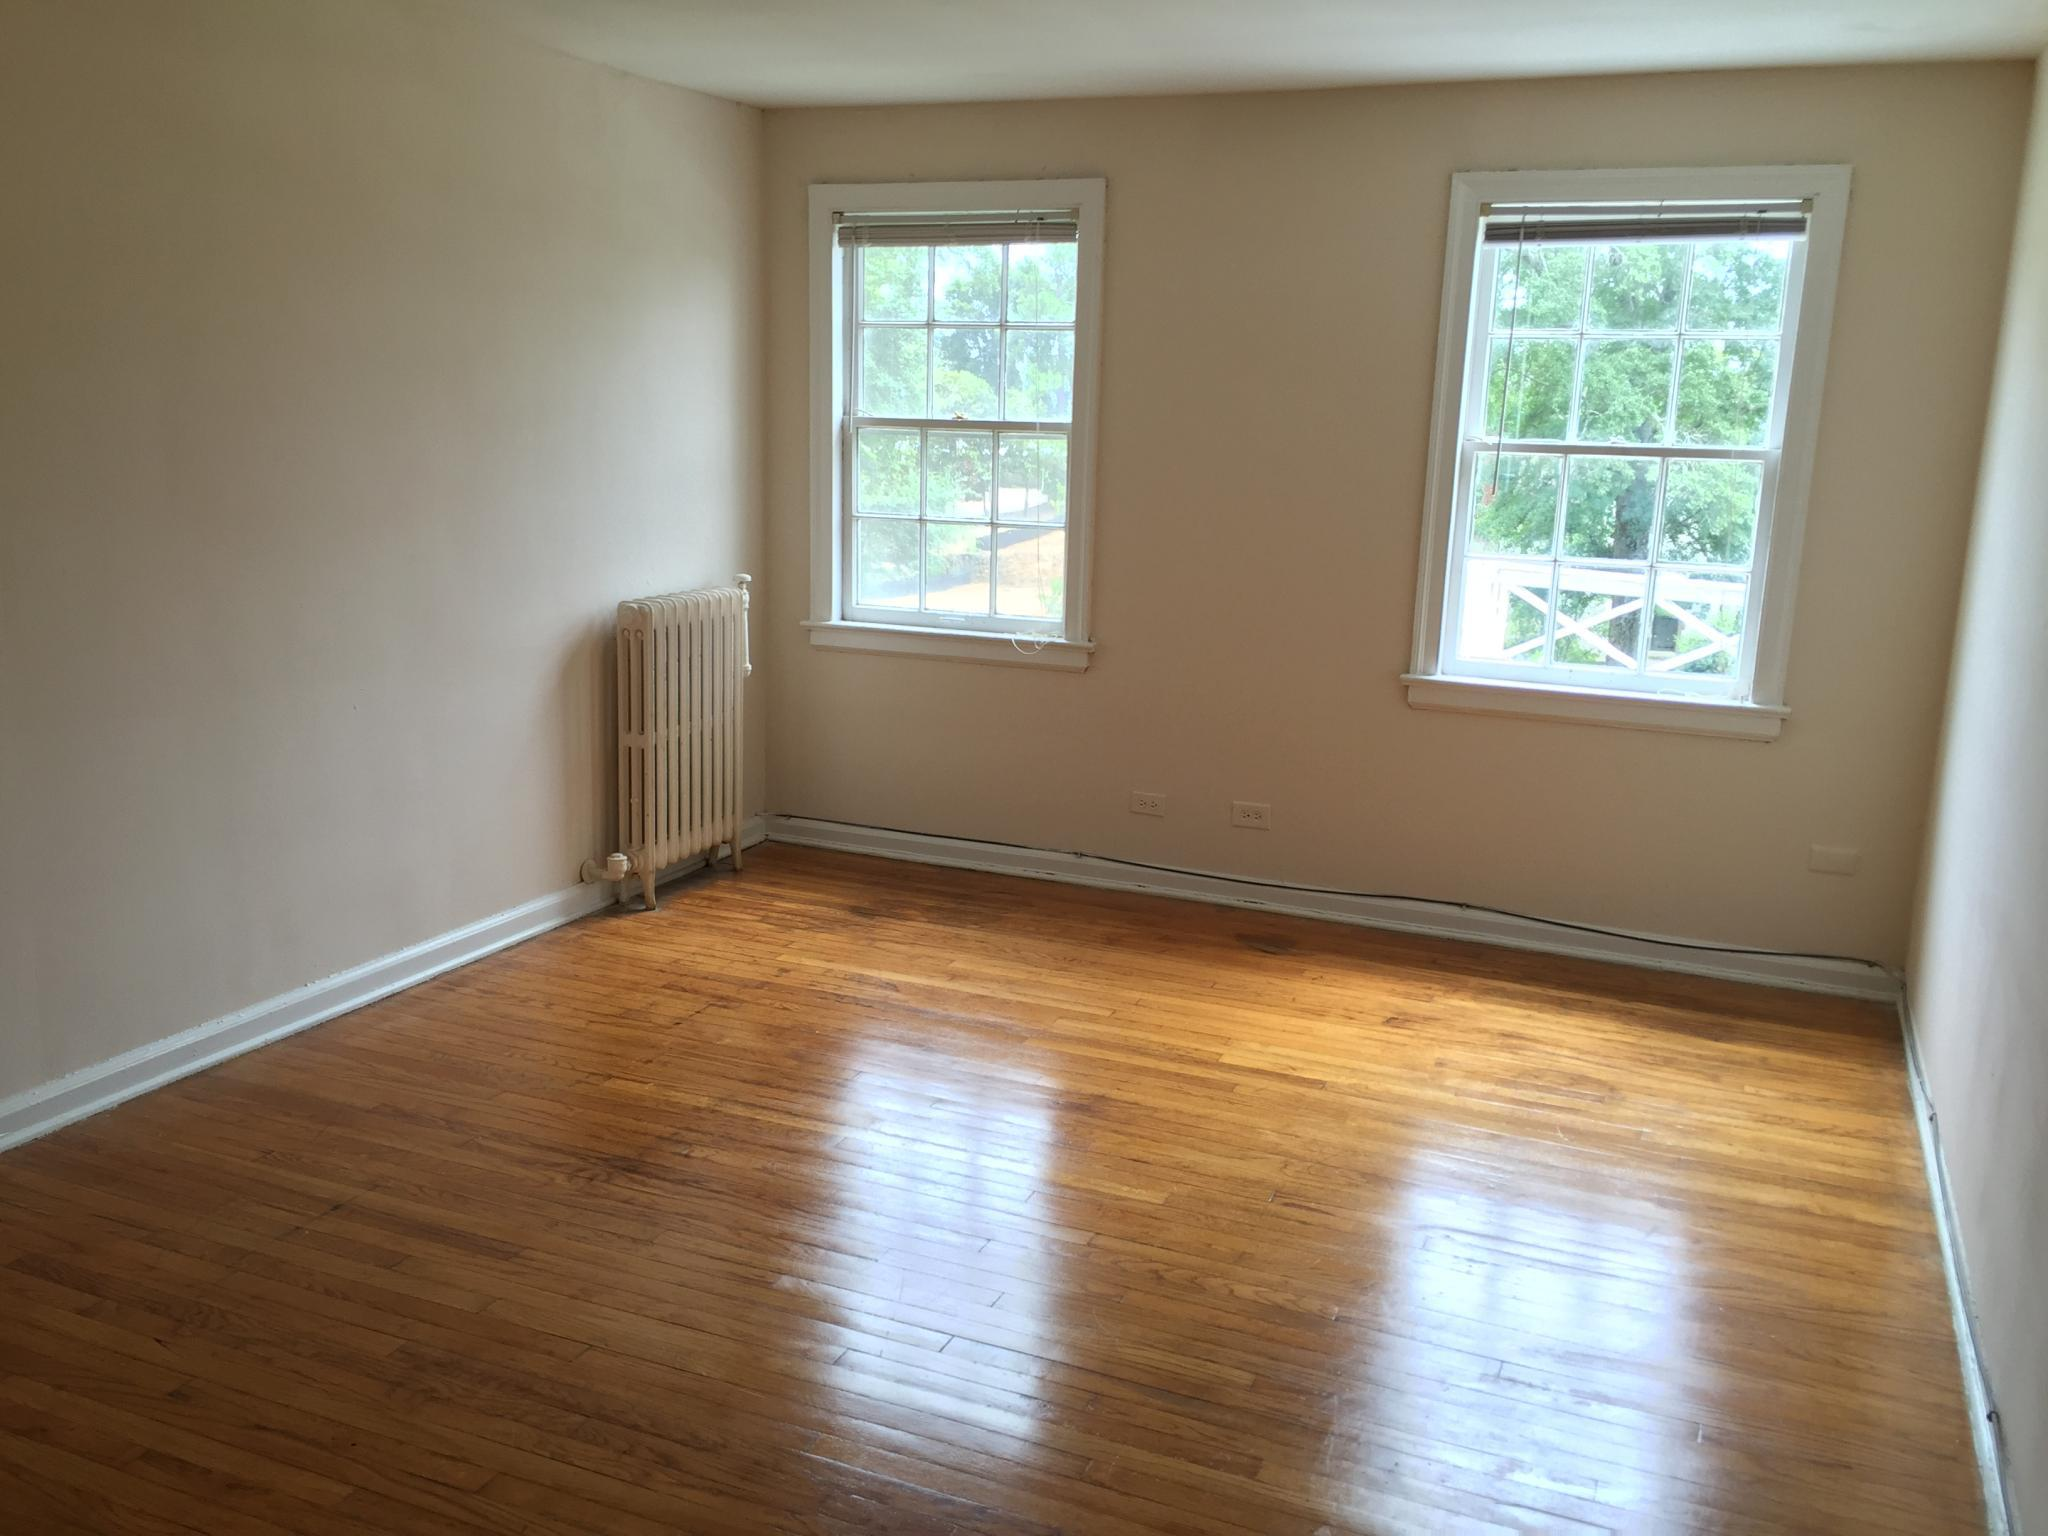 2852 Thornhill Rd, Birmingham, AL 35213 For Rent | Trulia